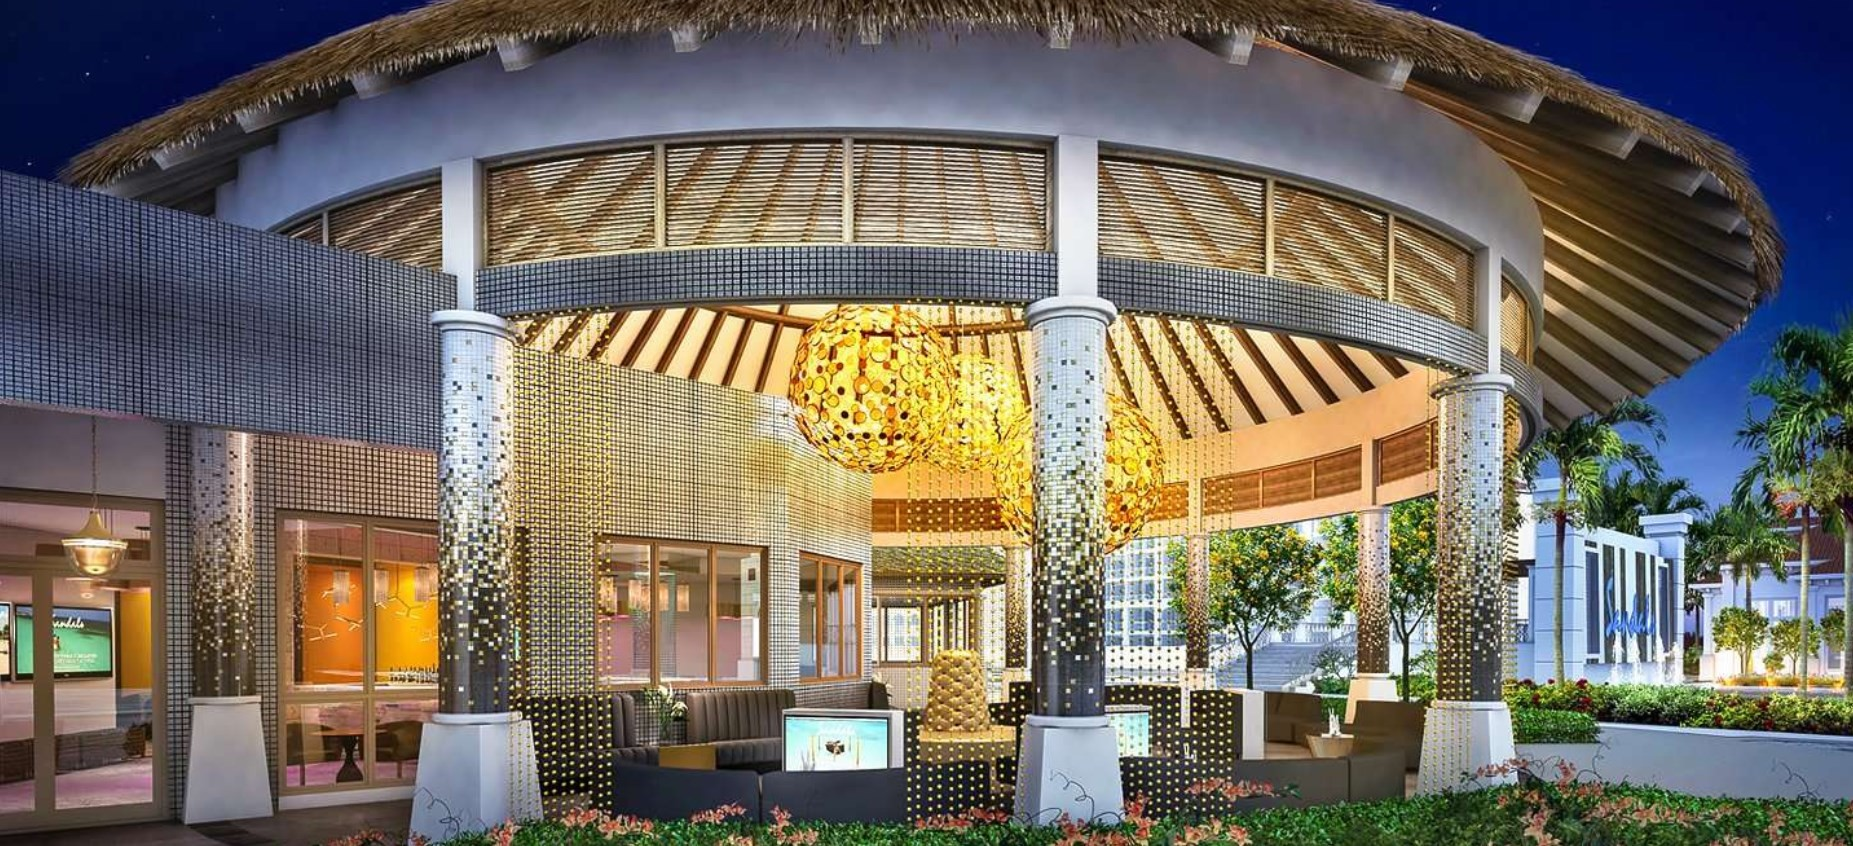 news-main-how-sandals-is-adapting-its-caribbean-resorts.1588702548.jpg